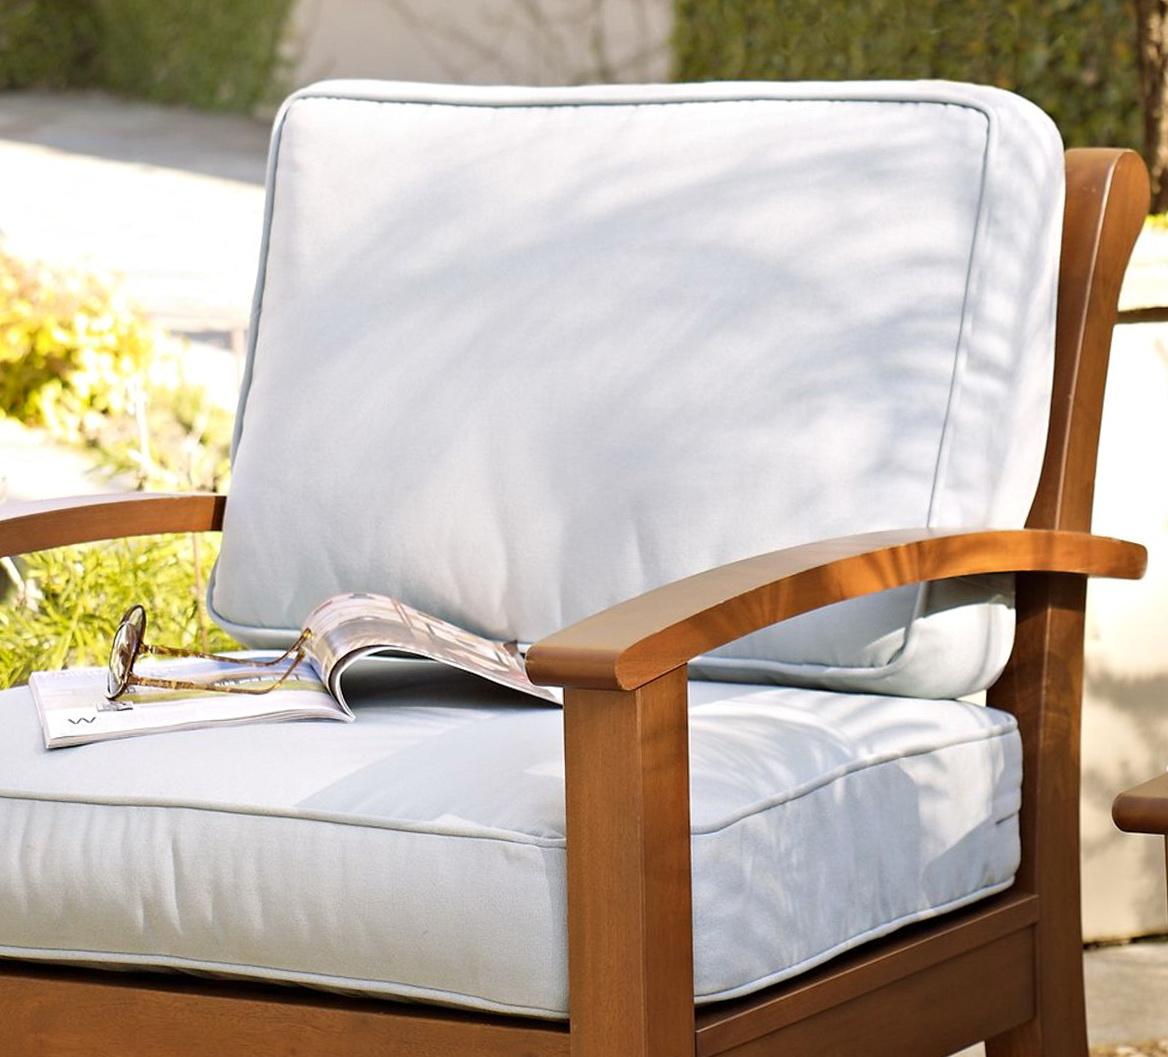 Pottery Barn Bench Cushions Home Design Ideas